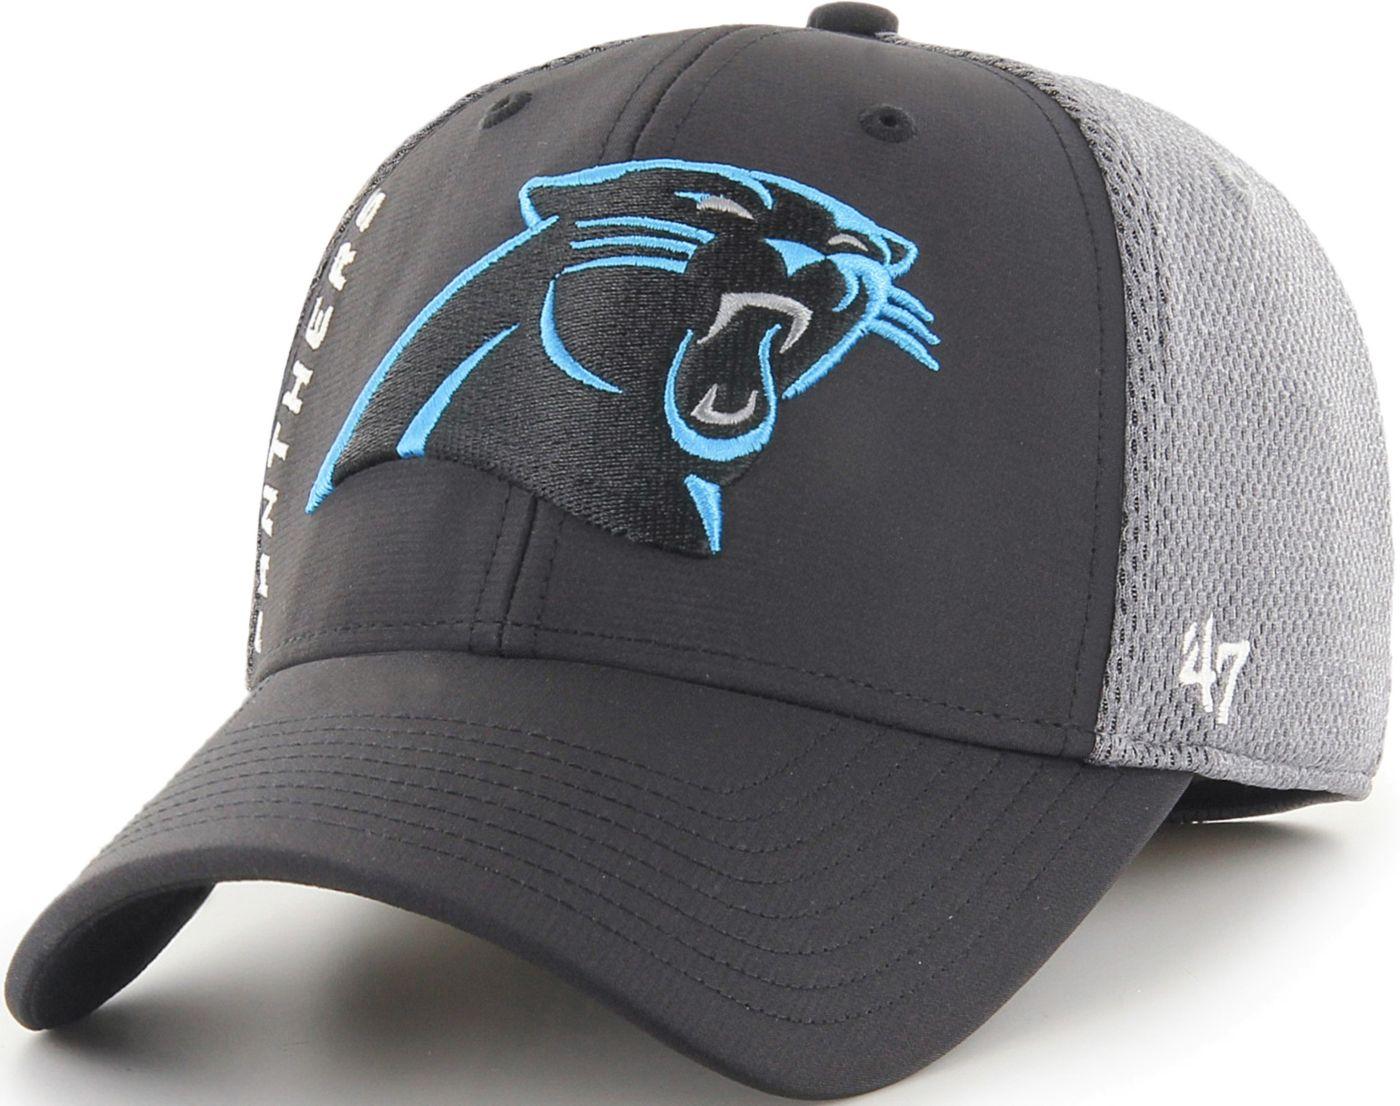 '47 Men's Carolina Panthers Wycliff Contender Stretch Fit Black Hat